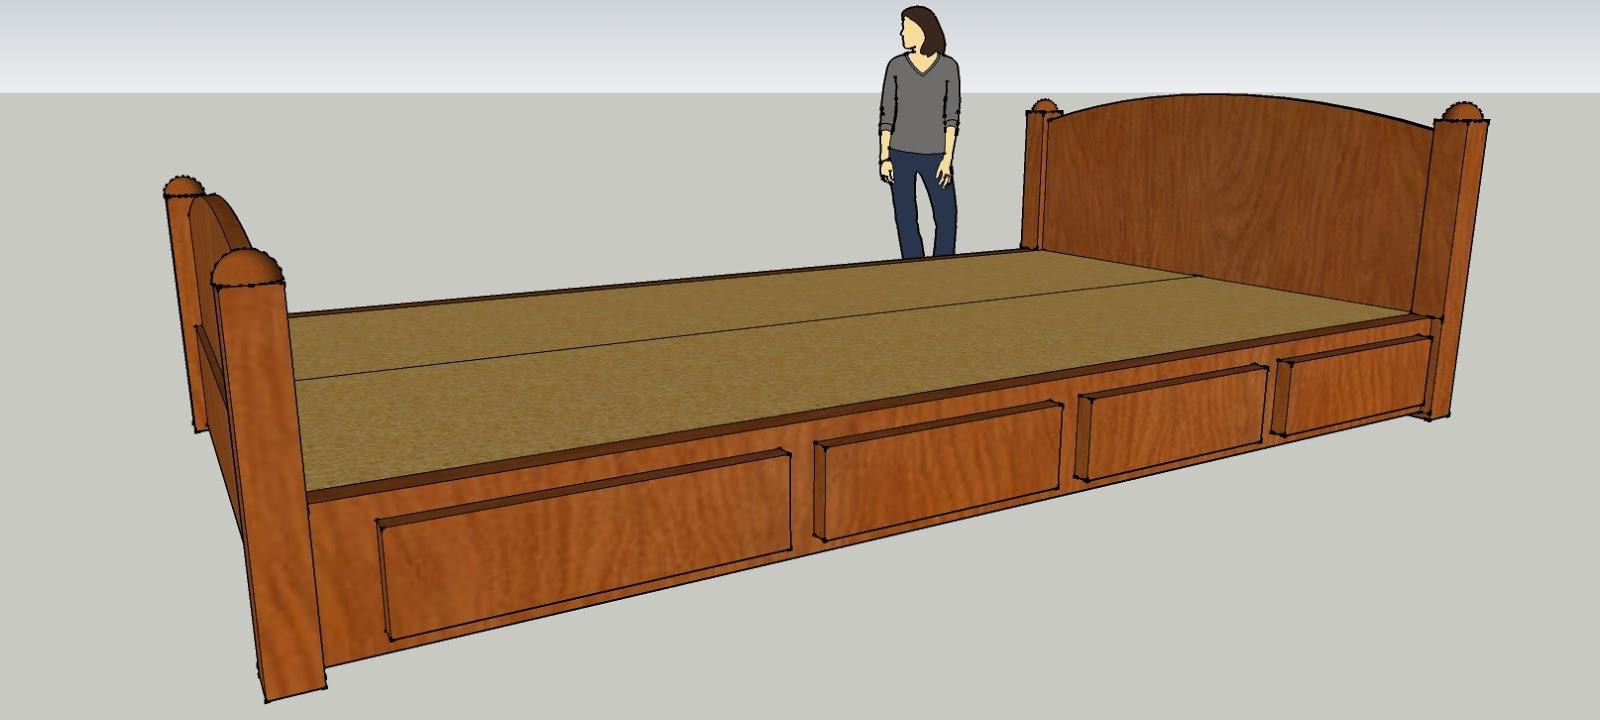 Scotts Contracting Design Build Project Platform Bed original design